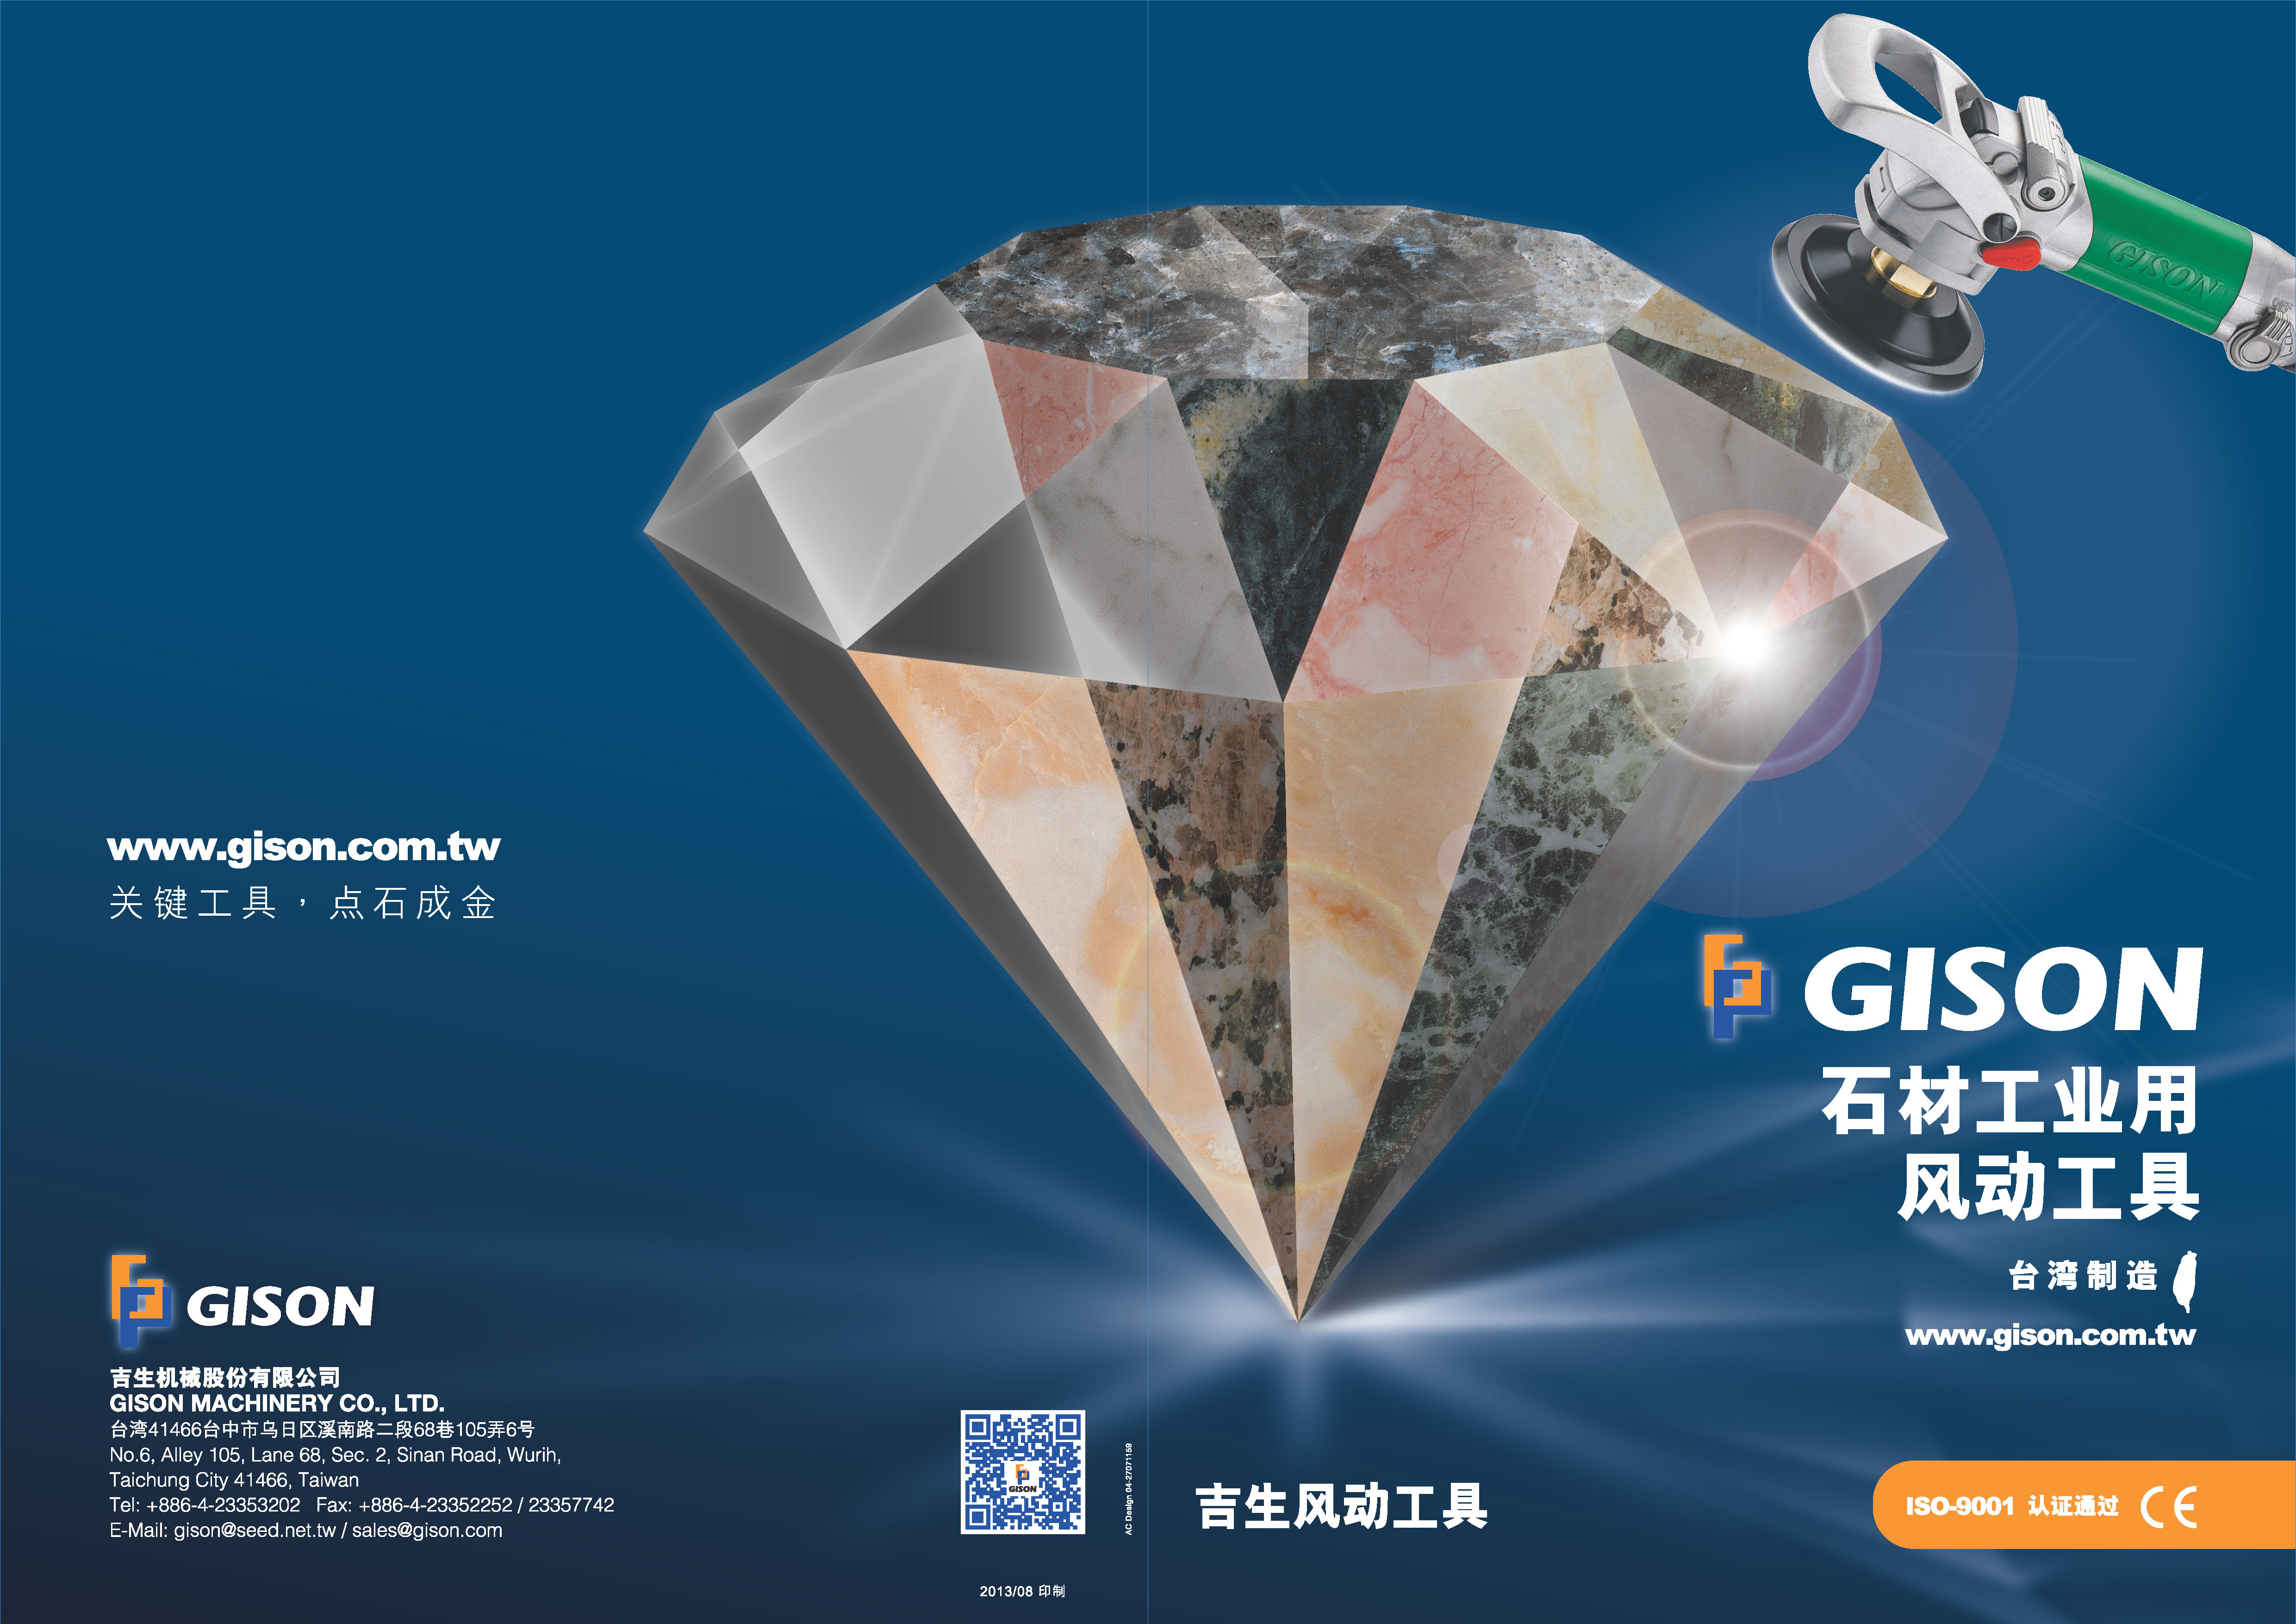 2013-2014 GISON GISON Stone Pneumatic Tools製品カタログ - 2013-2014 GISON GISON Stone Air Toolsカタログ